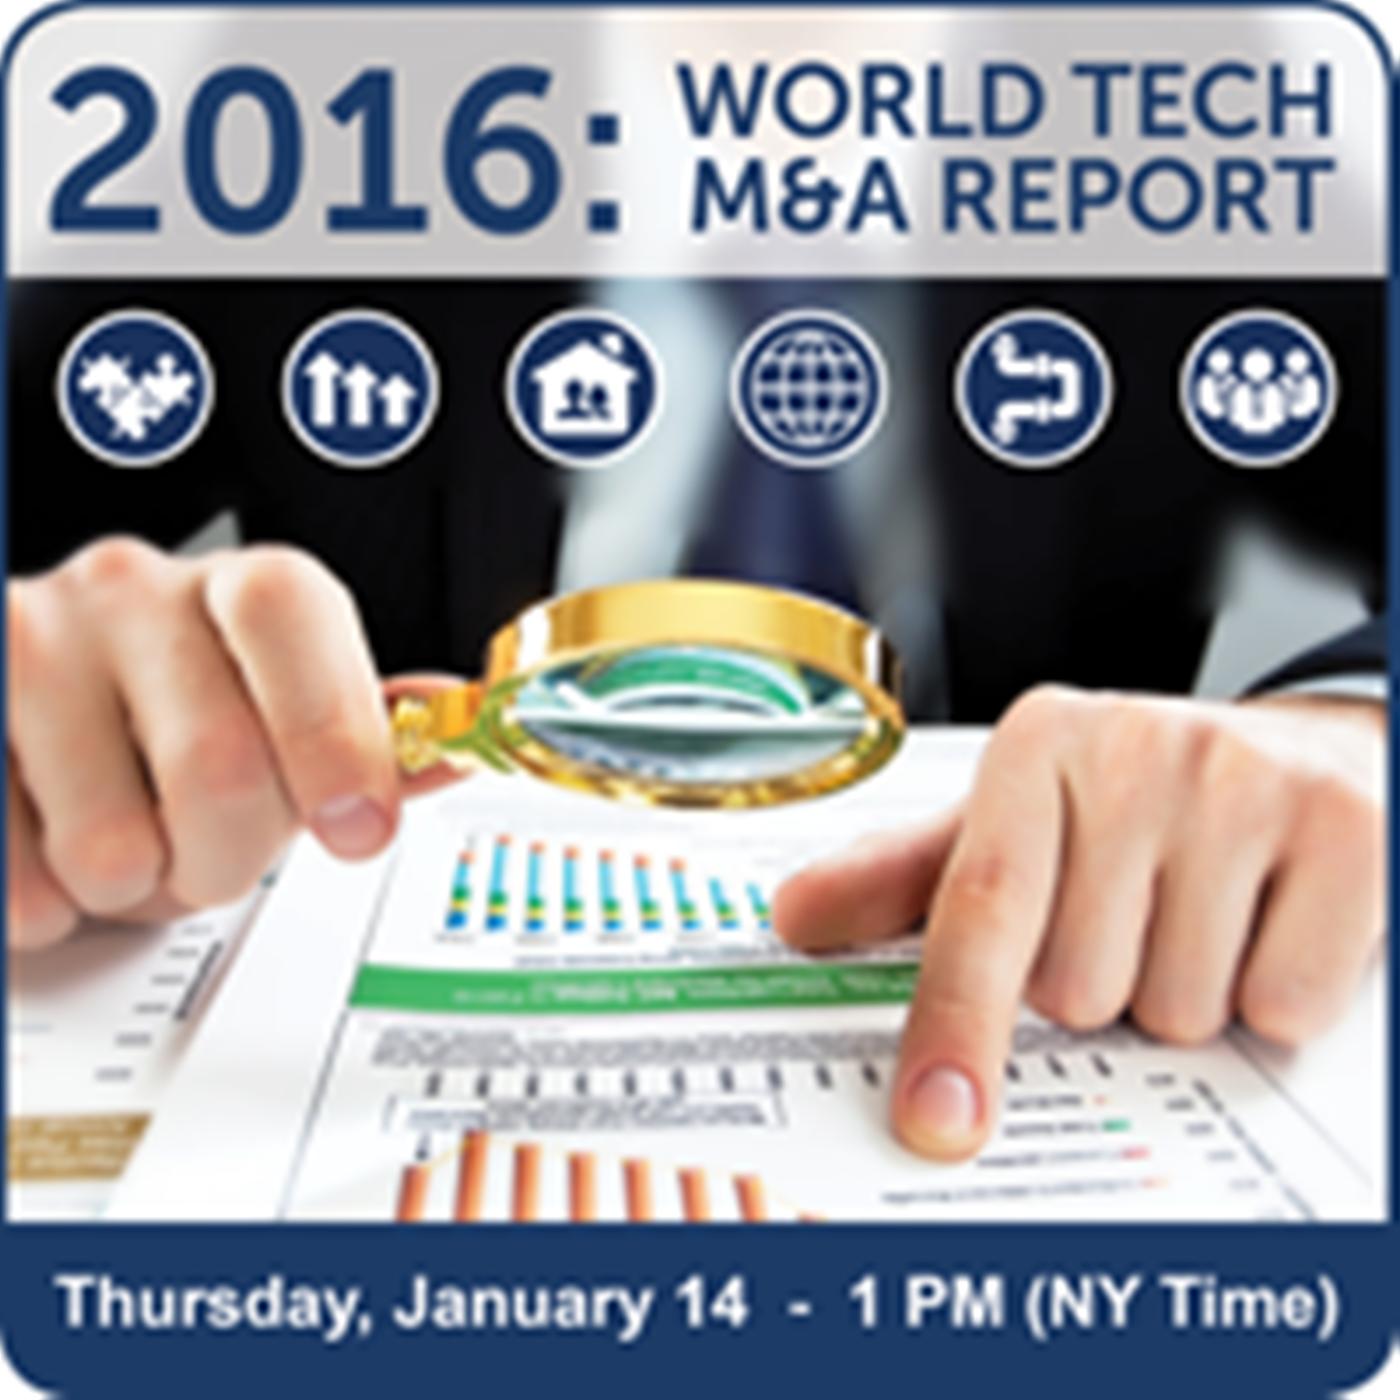 Tech M&A Annual Report - Top 10 Disruptive Tech Trends #1 & 2